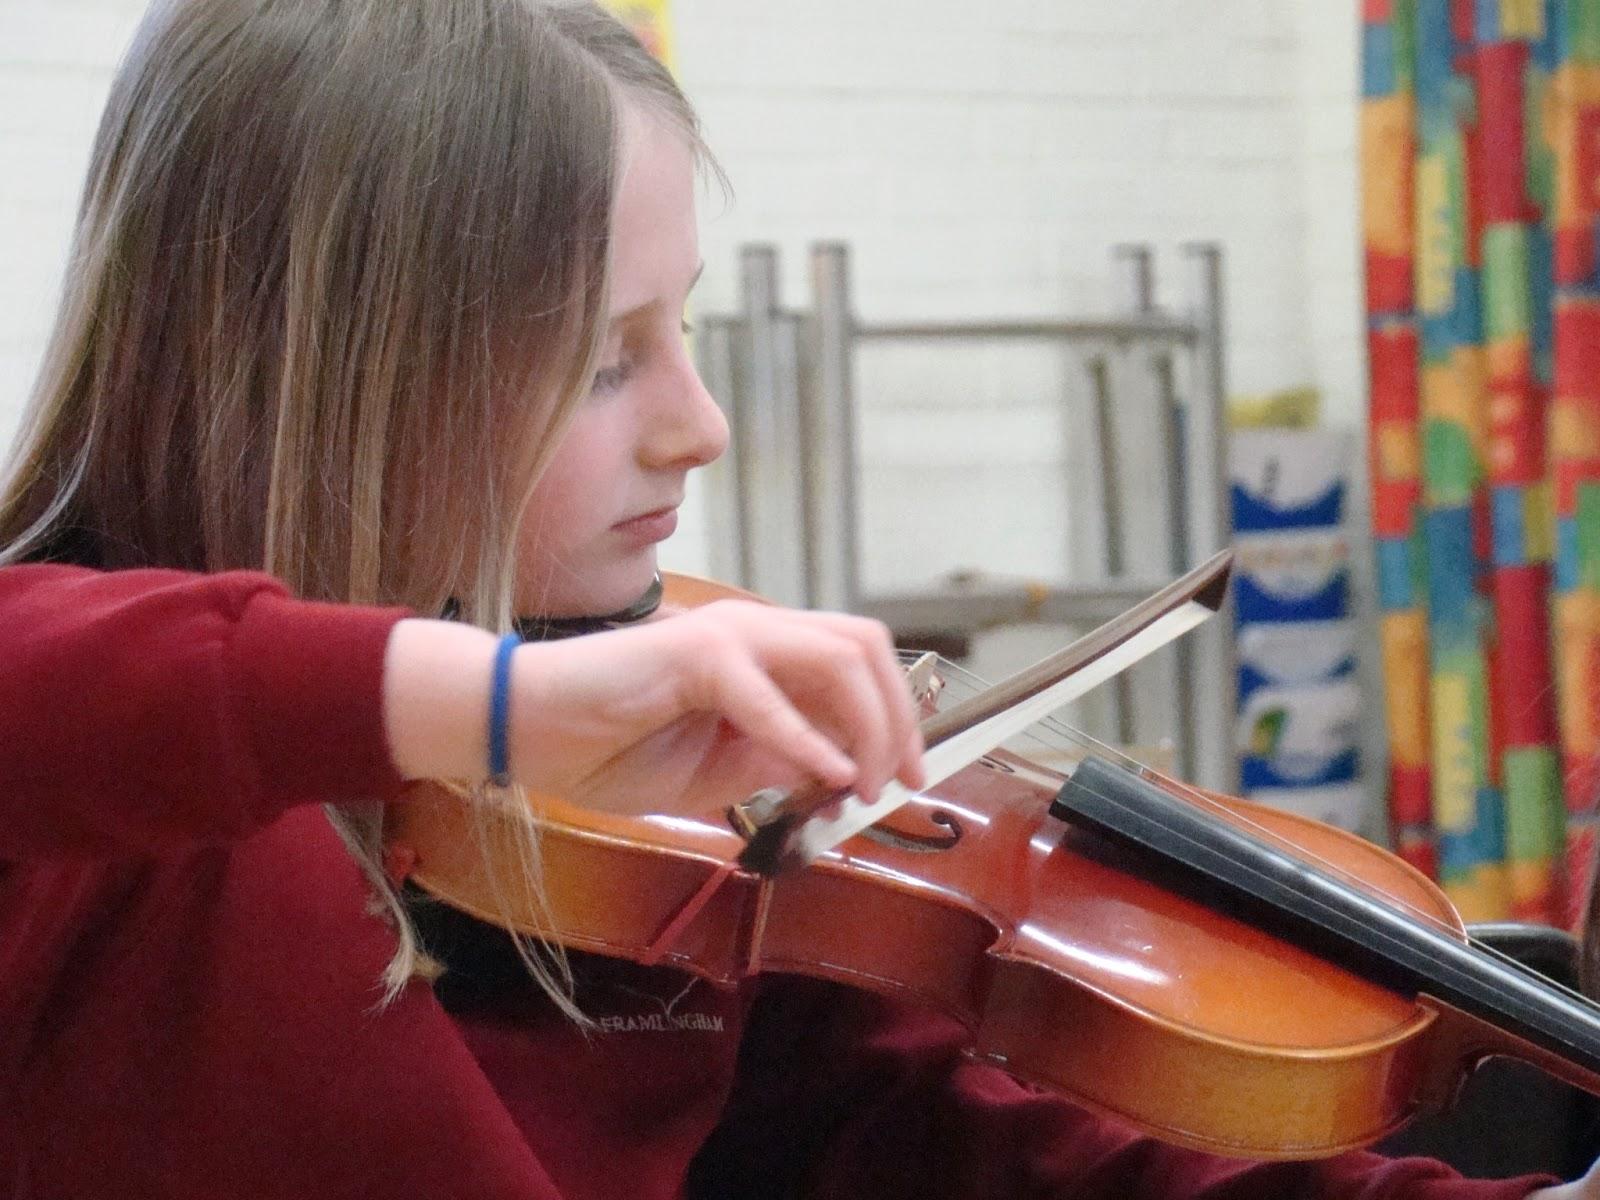 Hitcham's Blog: Violin Concert in School Hall